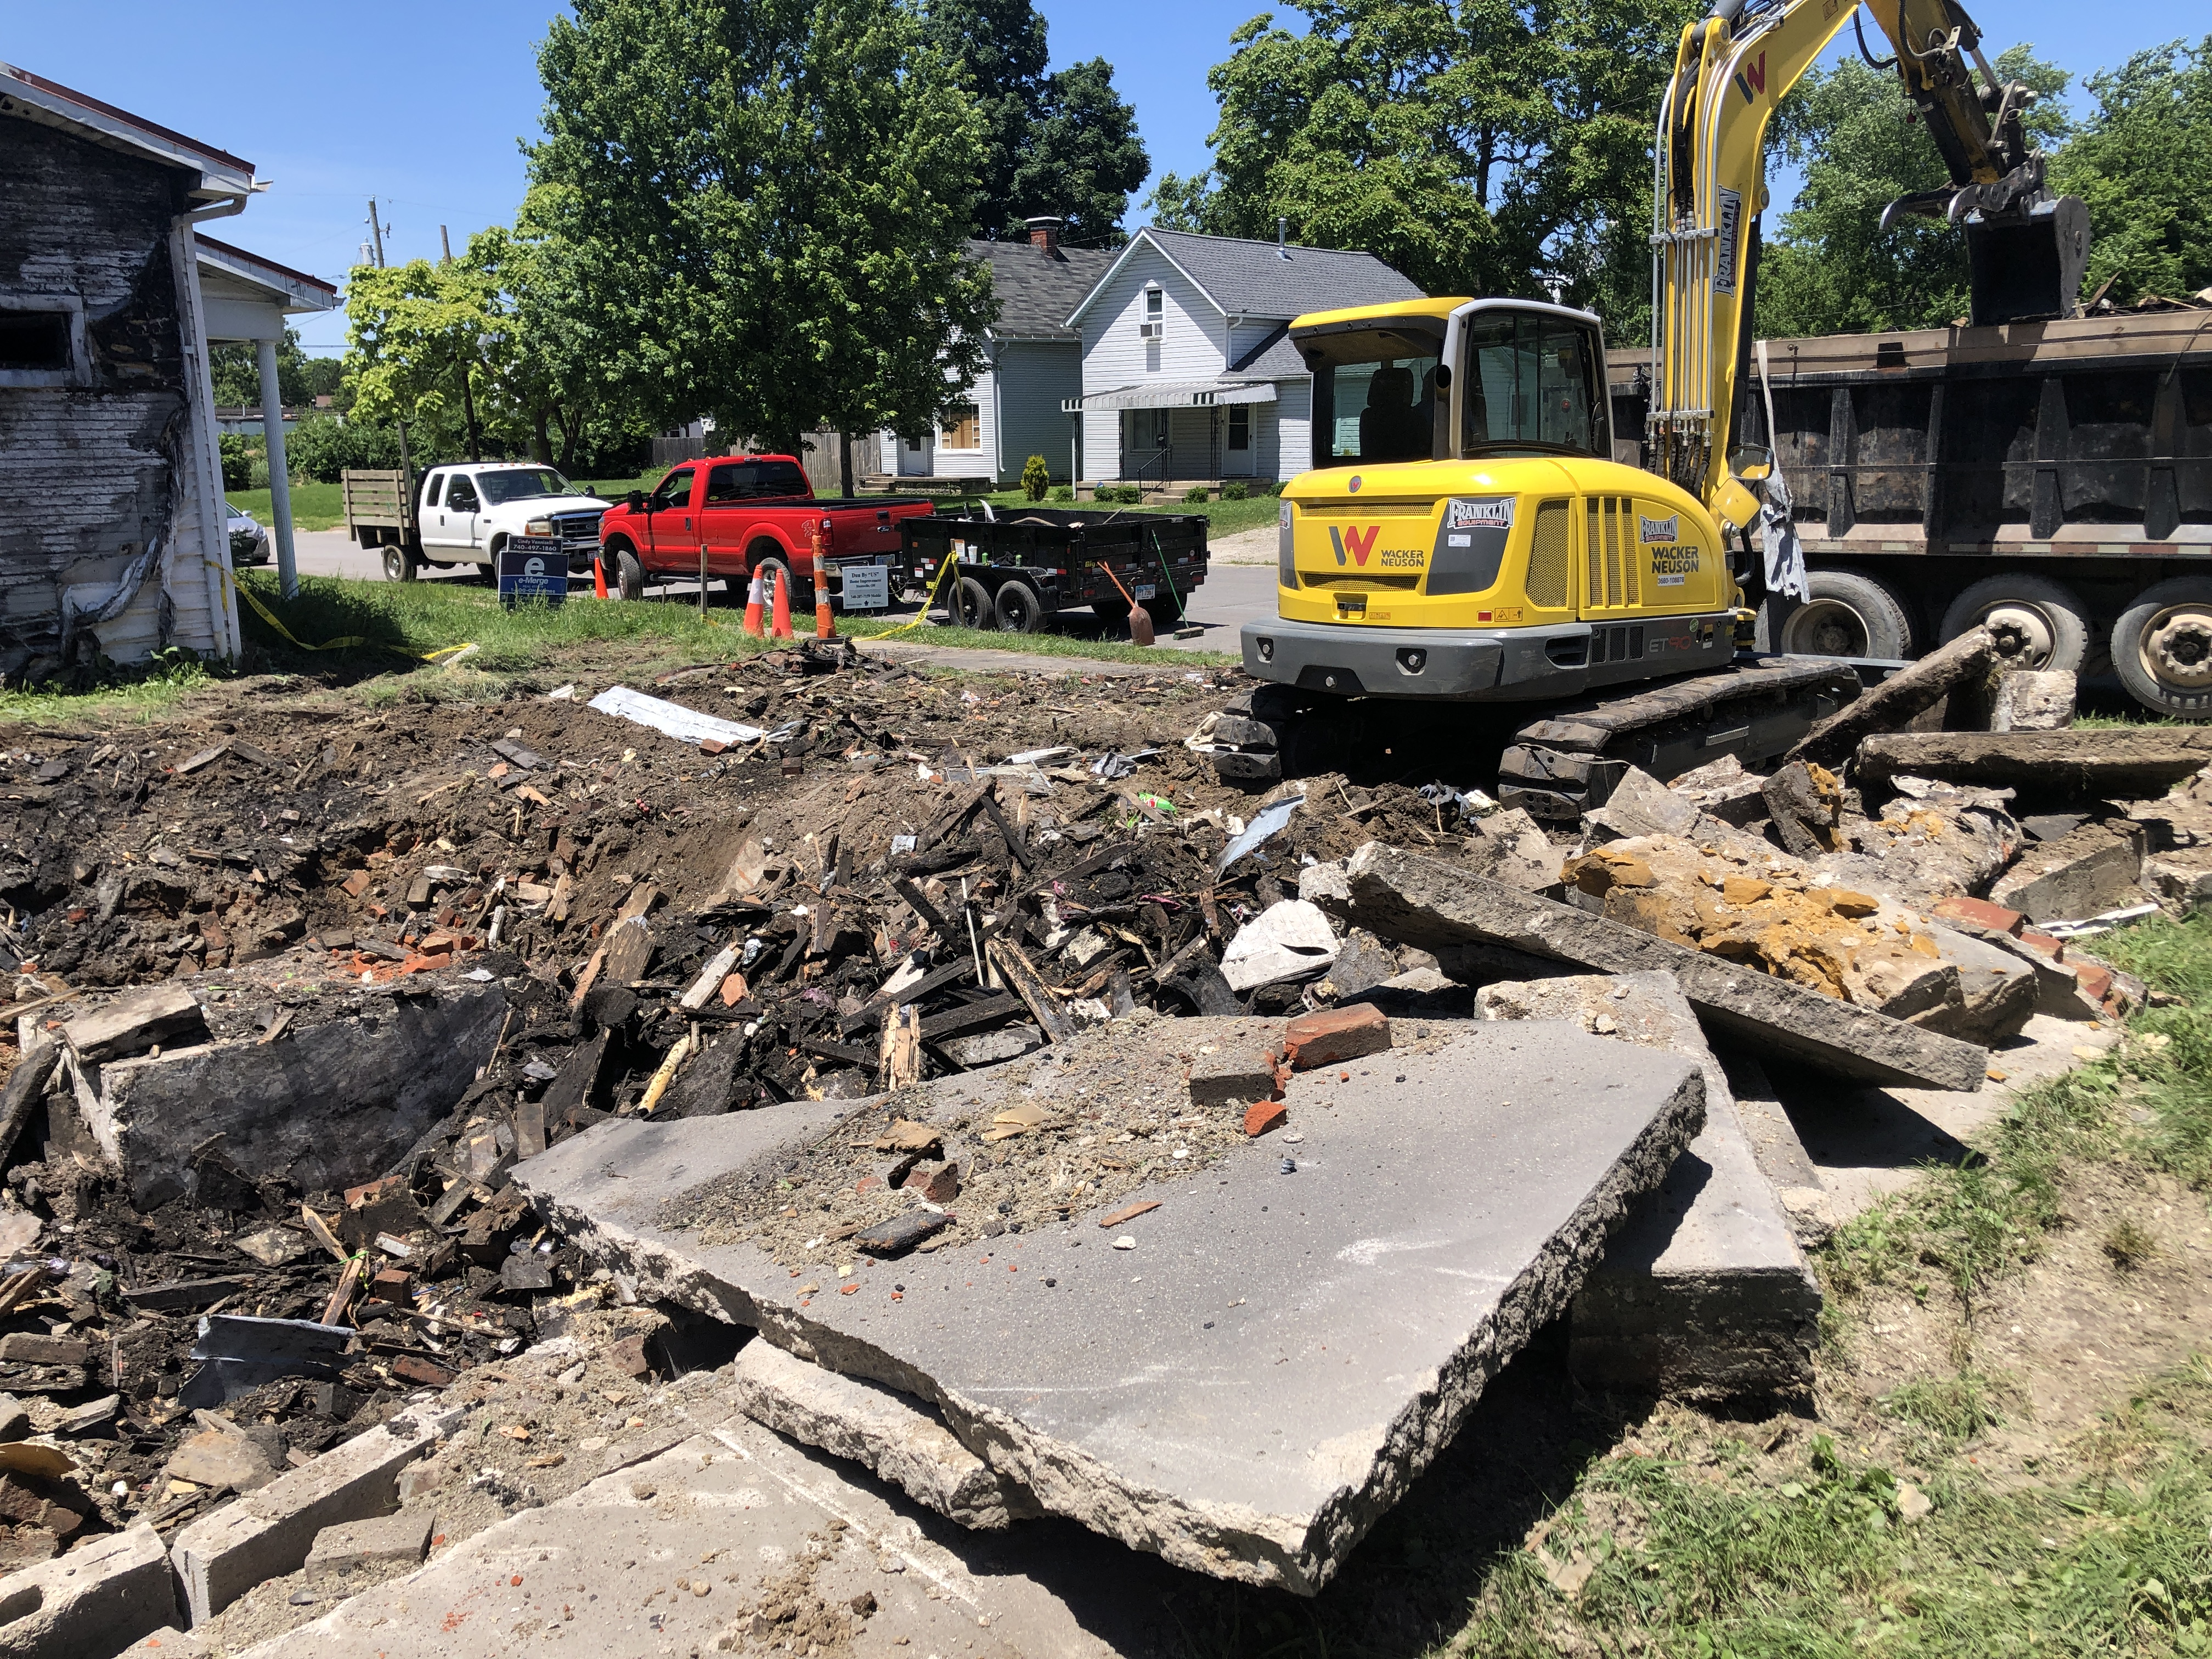 Logan Street Burnt Homes Being Torn Down - Scioto Post